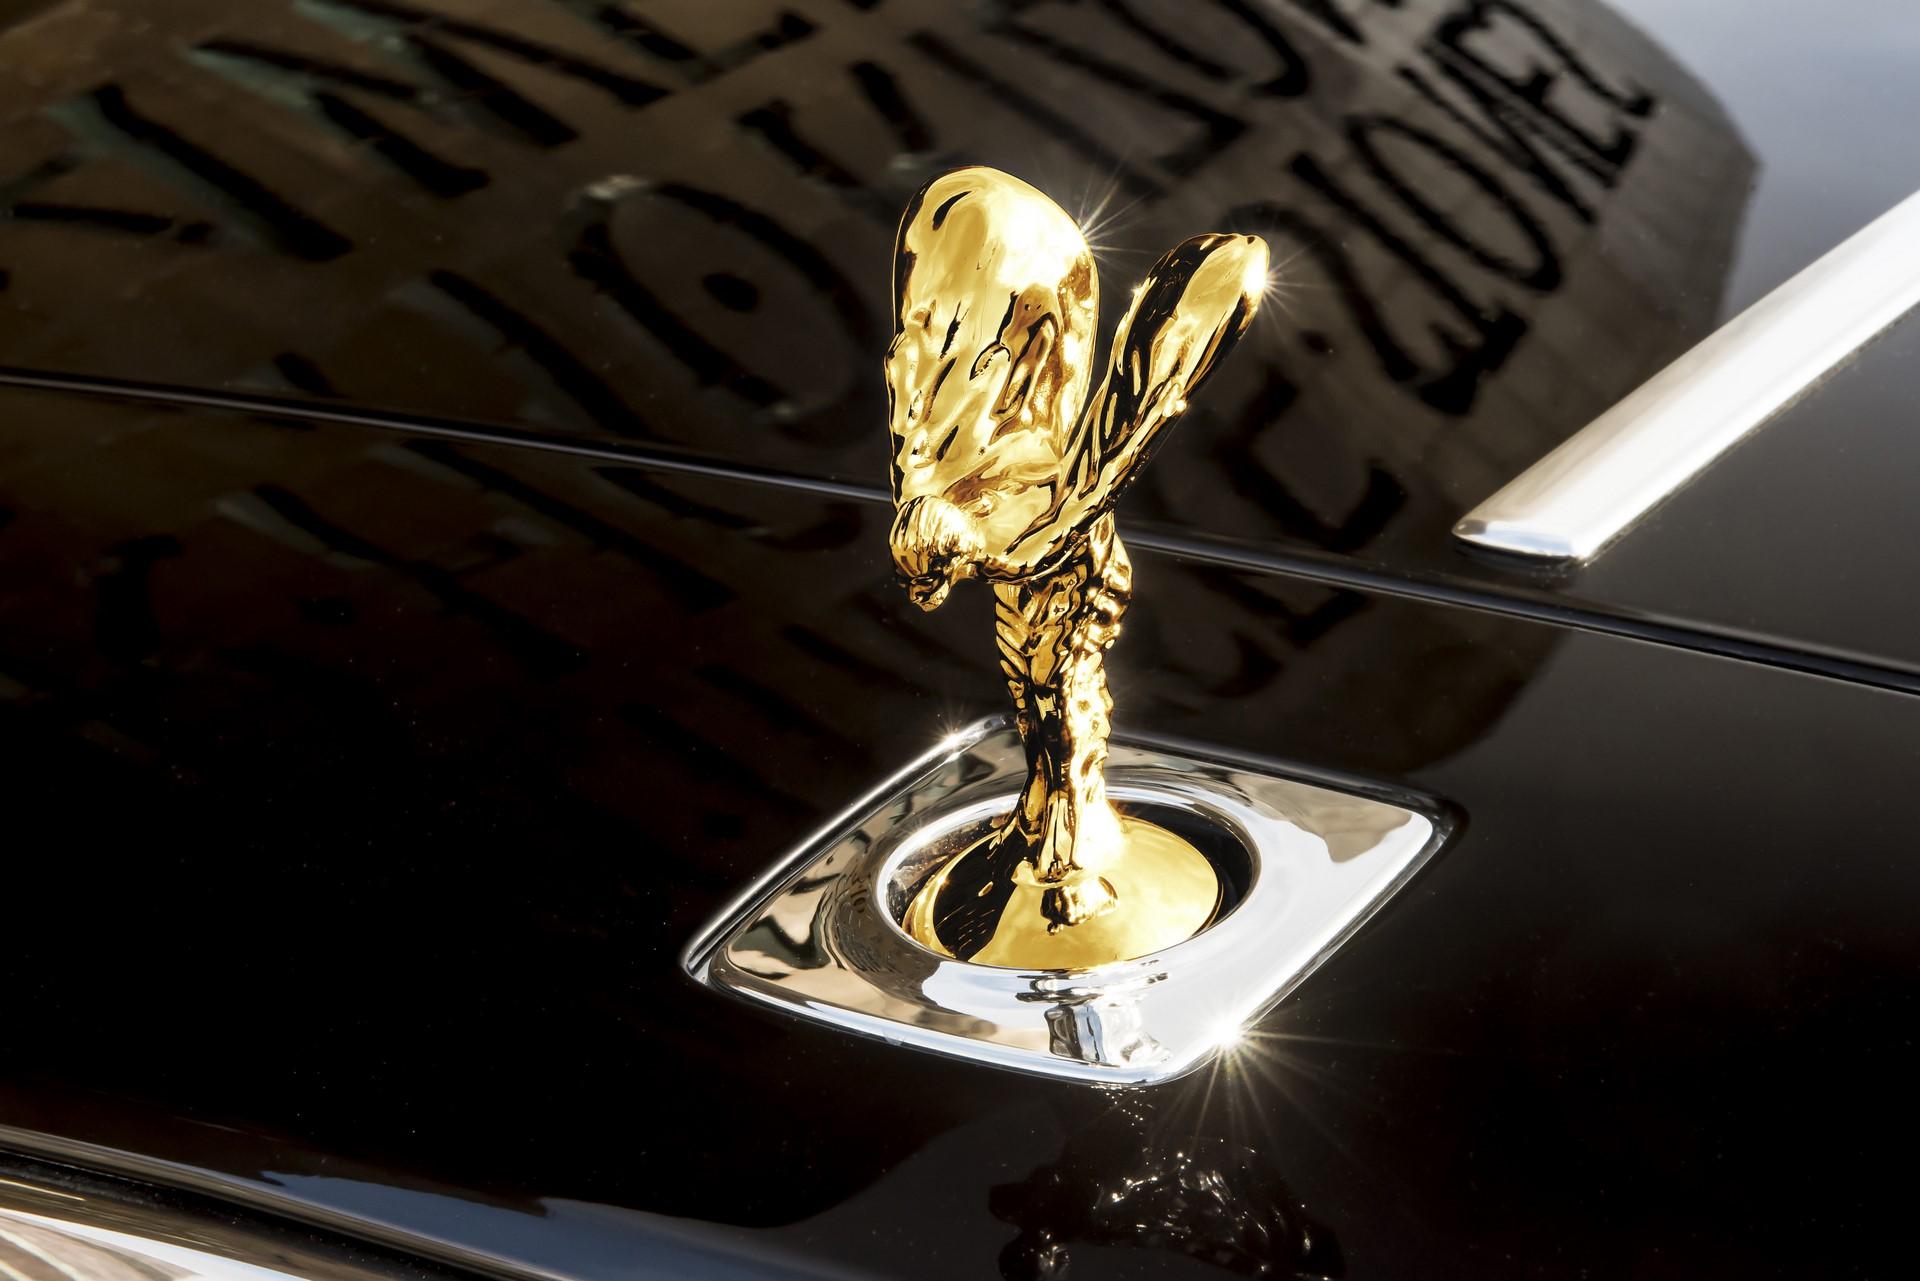 Rolls-Royce Wraith Inspired by British Music  Photo: James Lipman / jameslipman.com